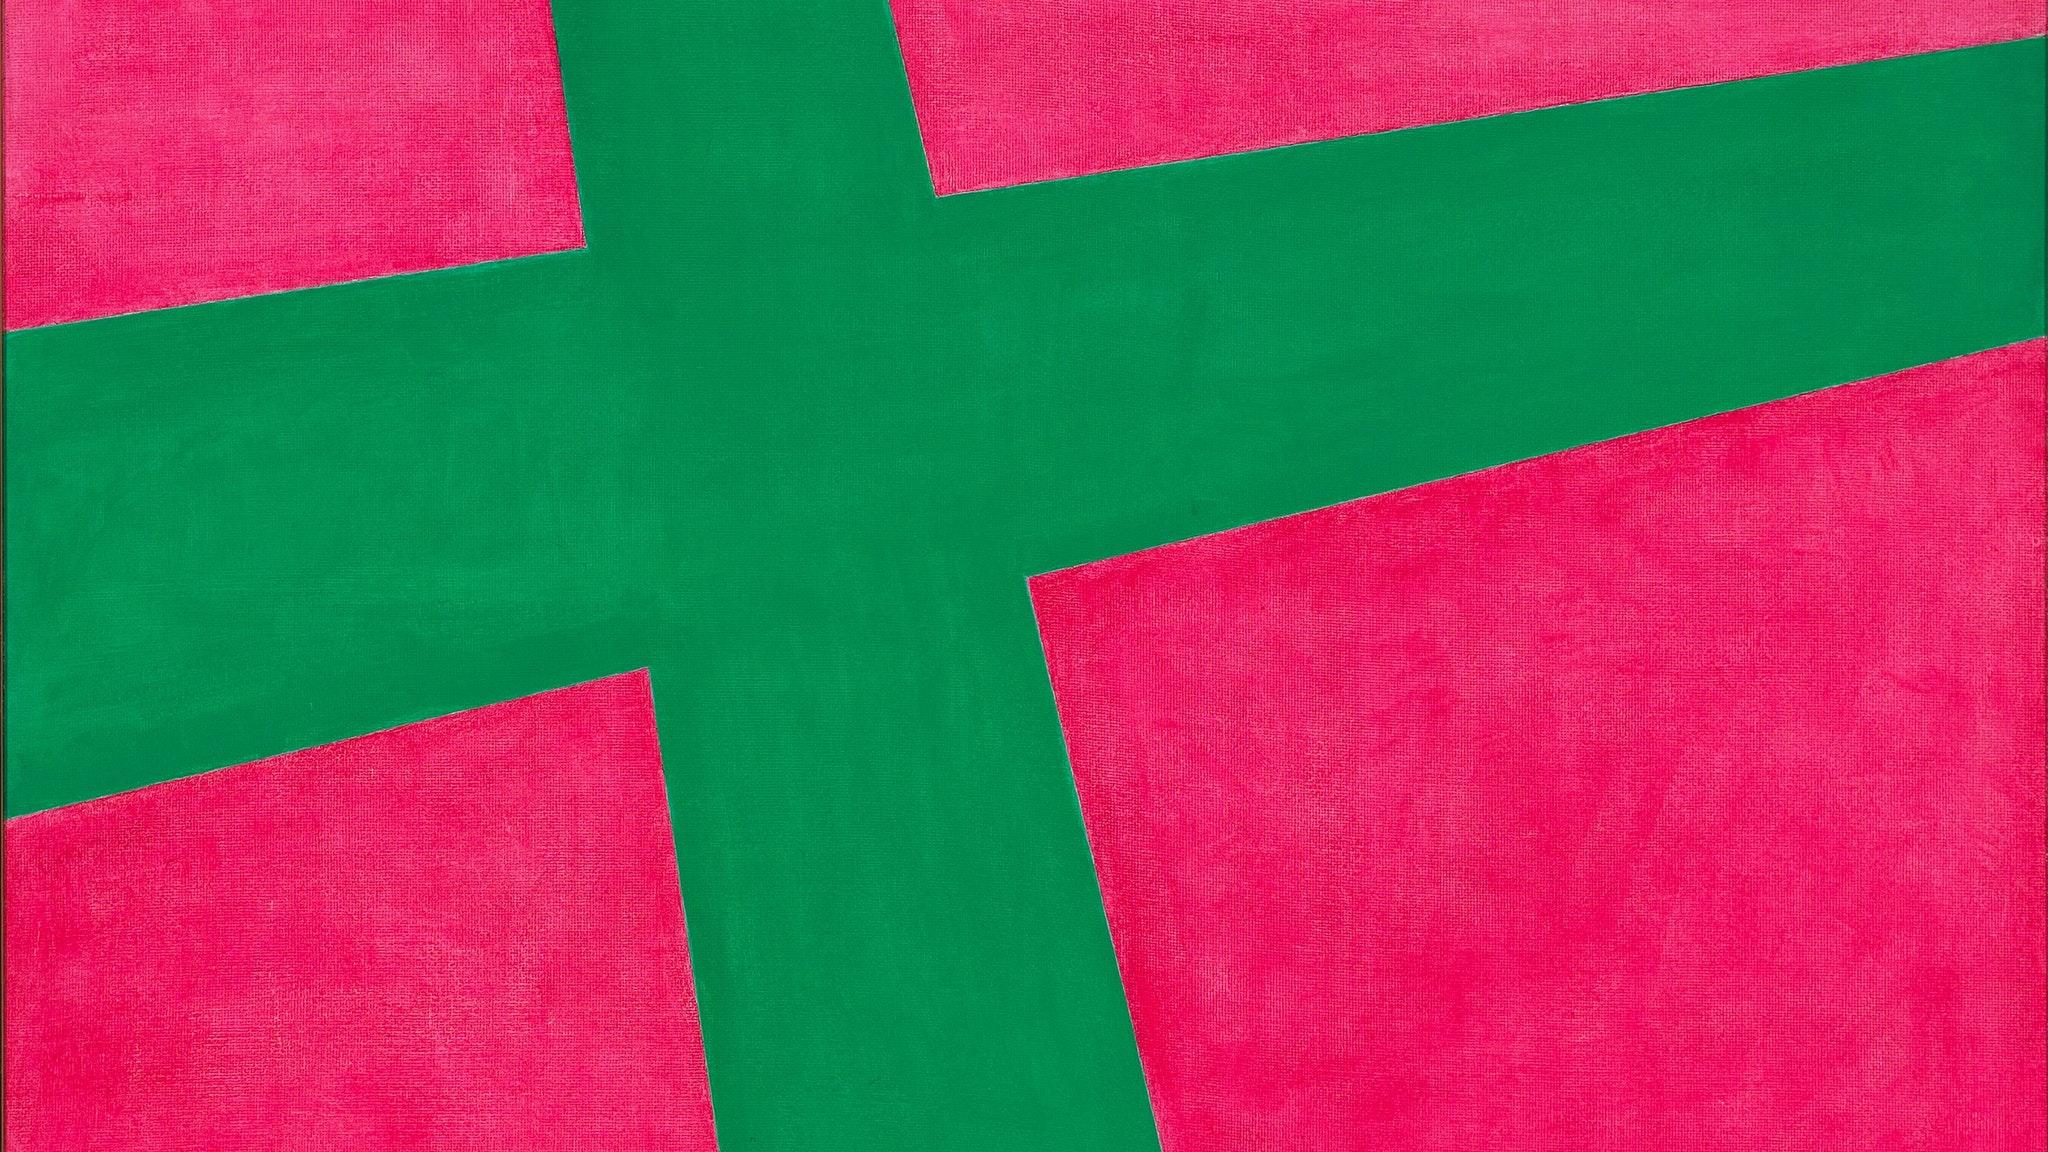 Gunter Christmann, Red/Green Cross 1966, oil on composition board 122 x 122 cm